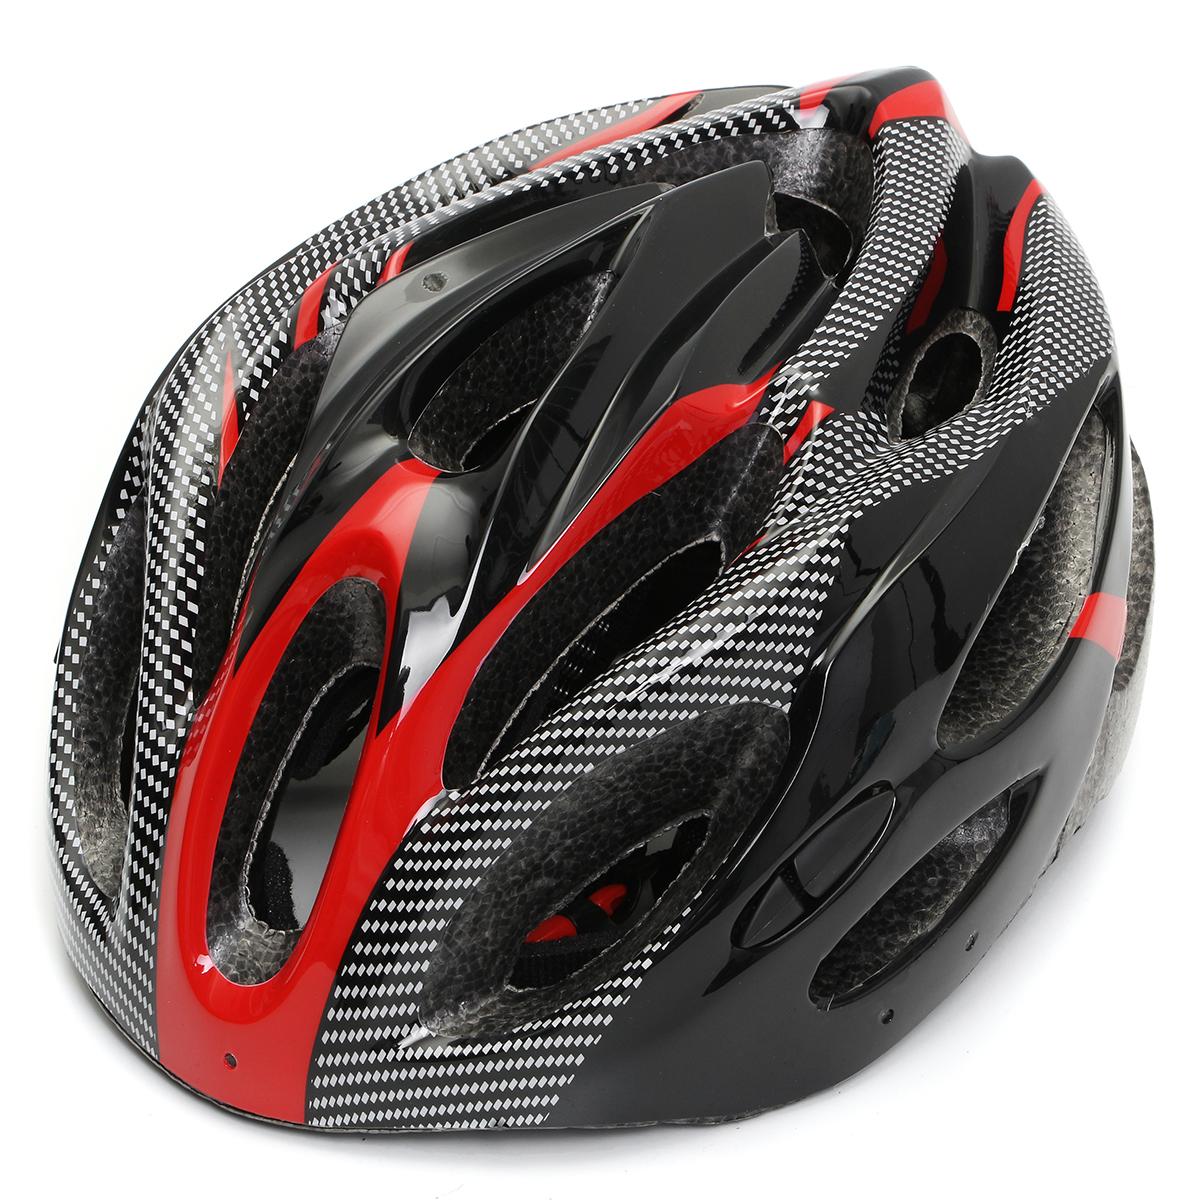 Mountain Bike Road Helmet Adjustable Mens Womens Adult Sport Cycling Bicycle